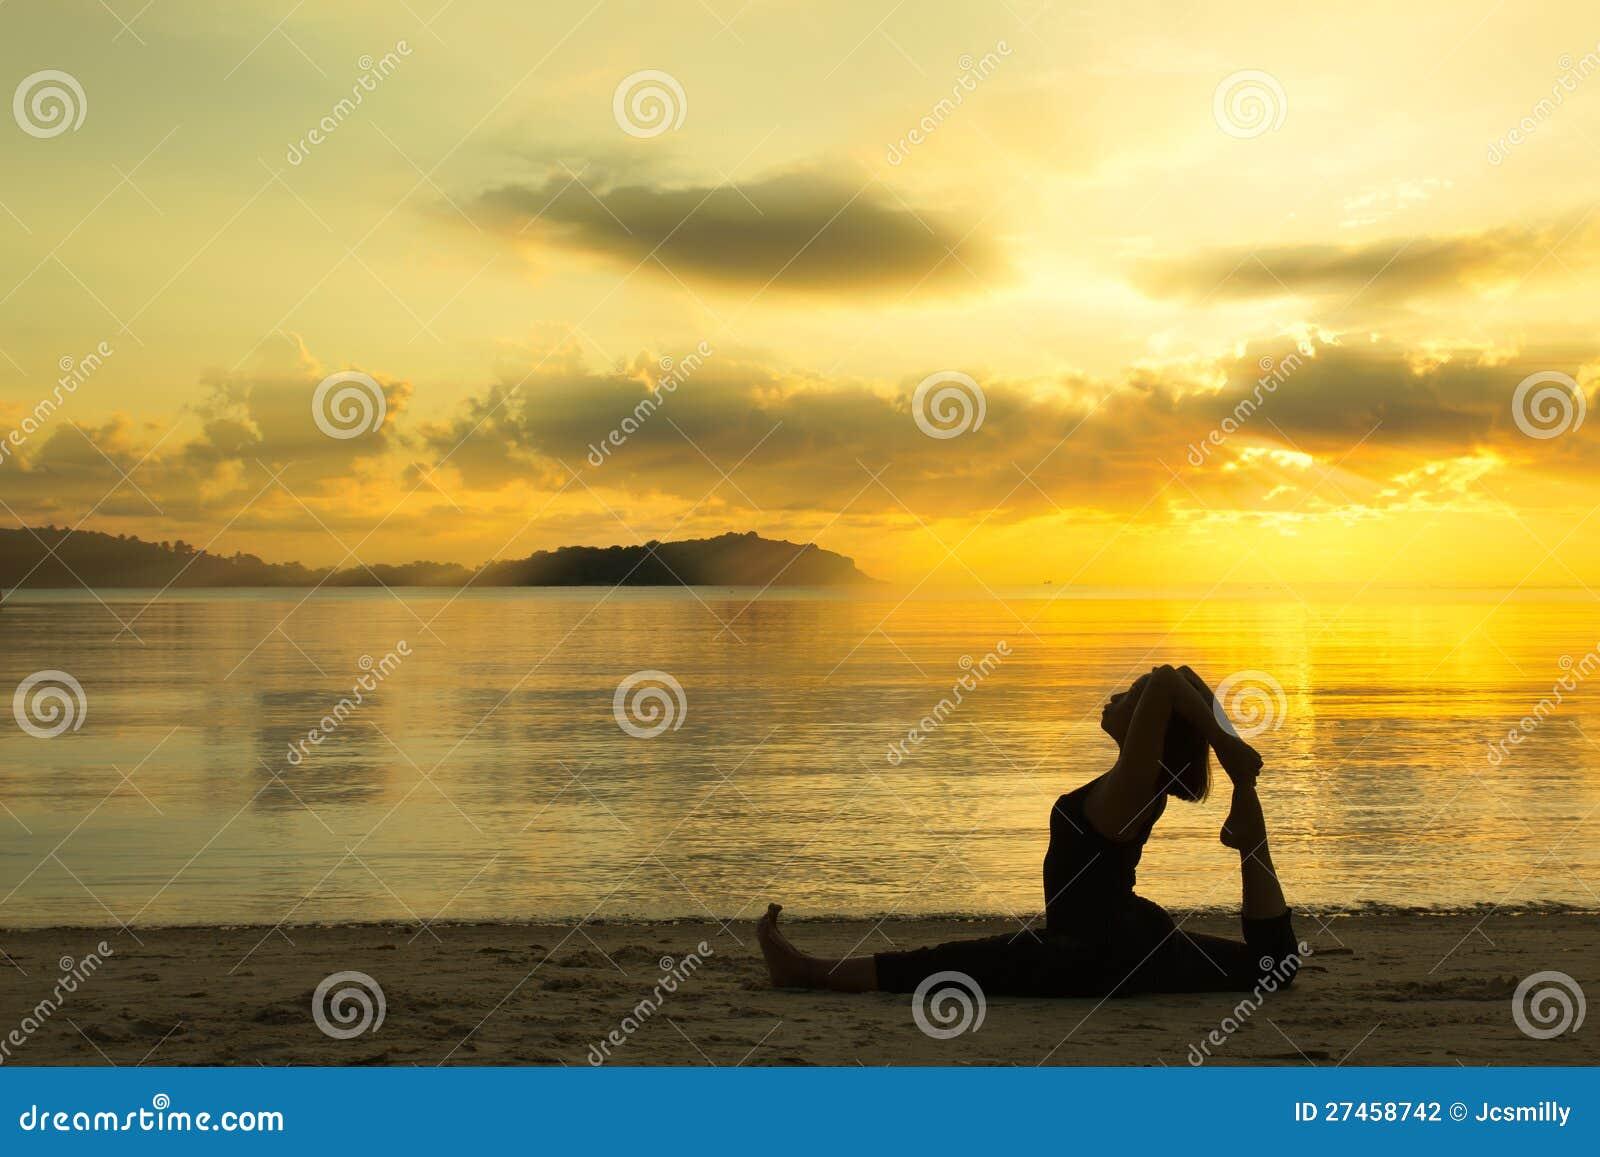 Beautiful Beach Sunrise With Woman Hot Girls Wallpaper